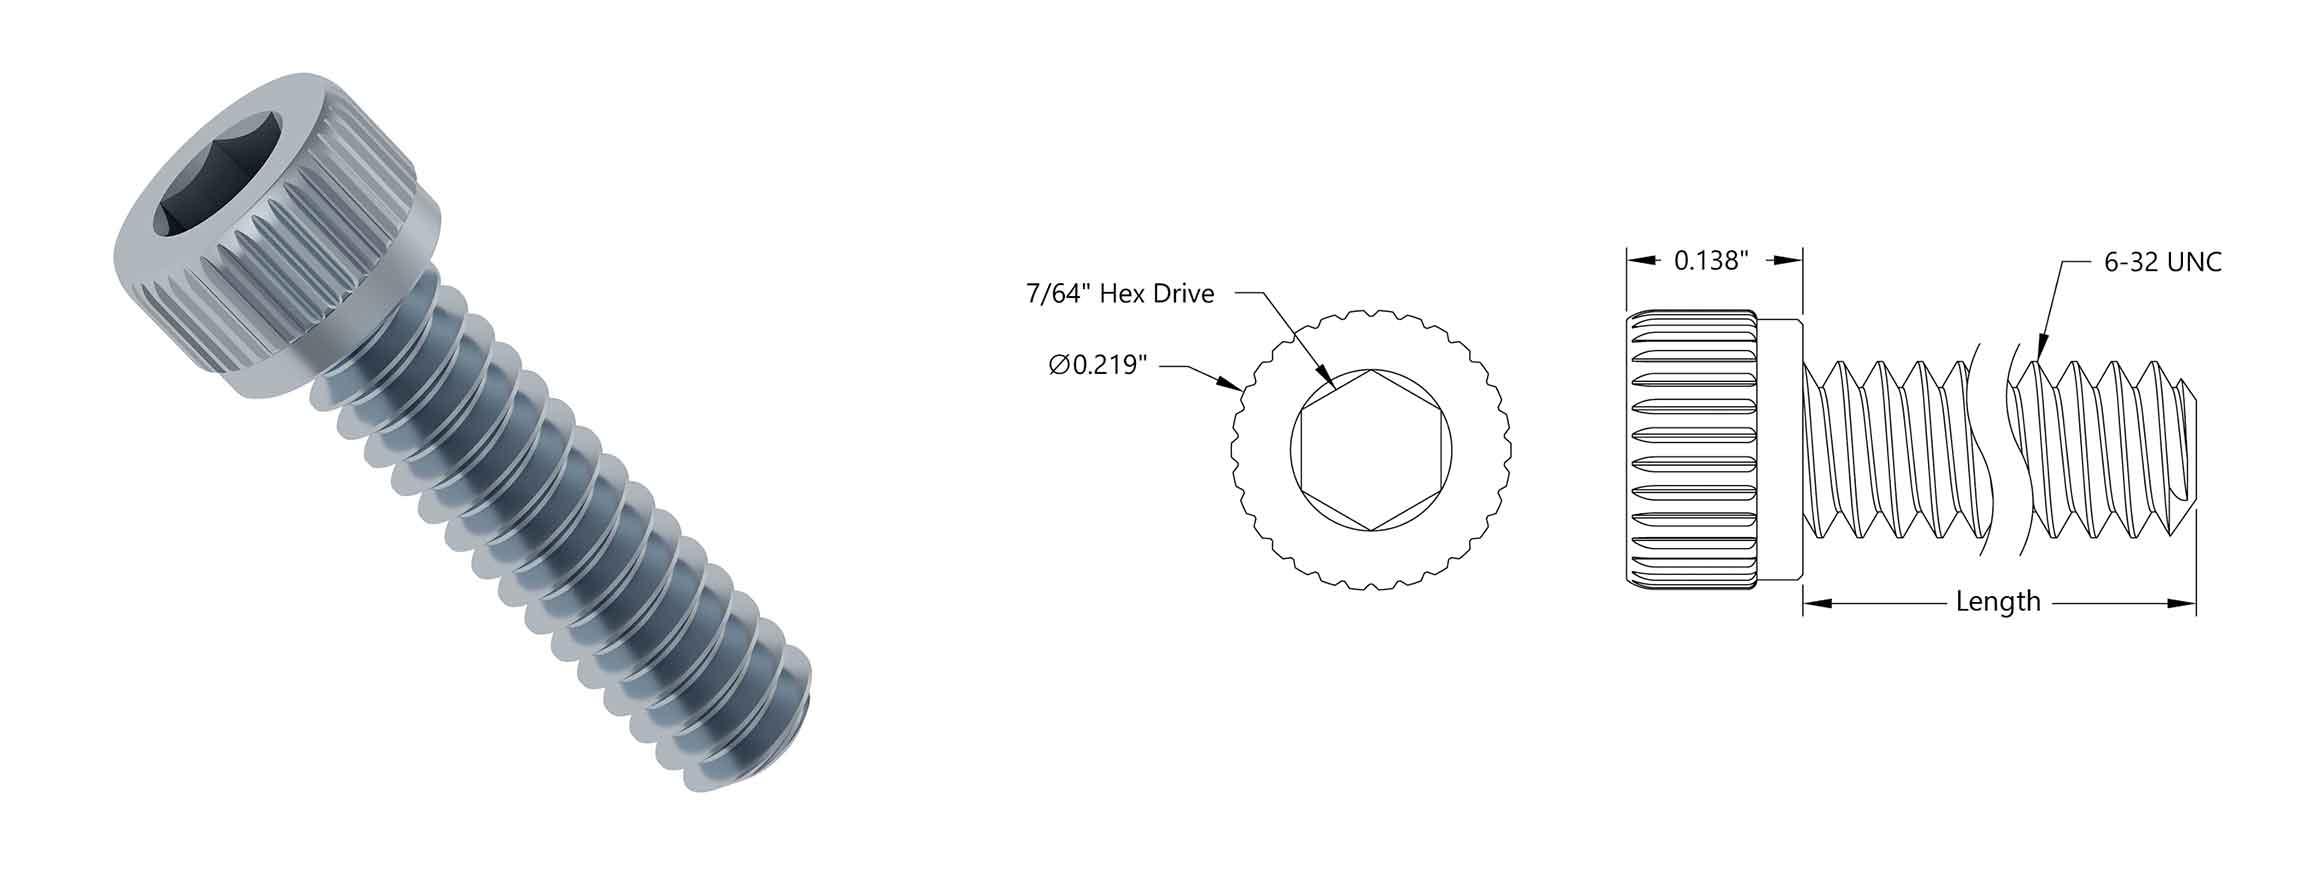 6-32-socket-head-screw-header.jpg